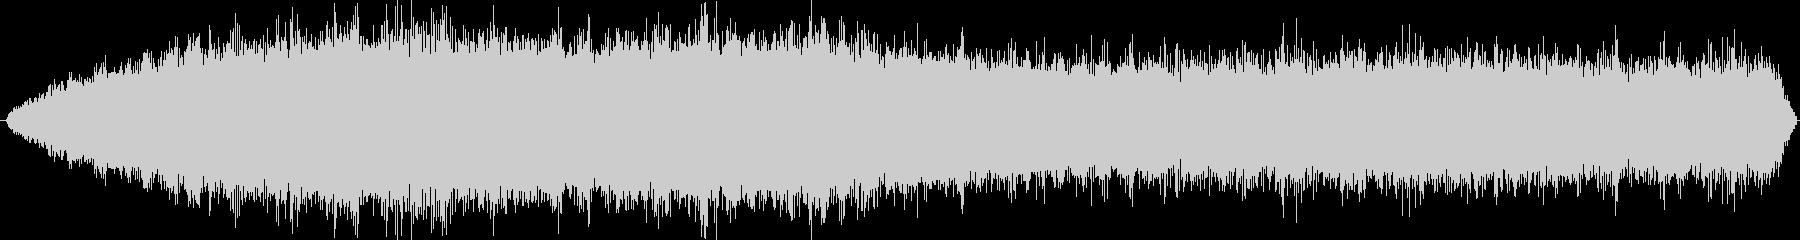 PADS カテドラルエア02の未再生の波形